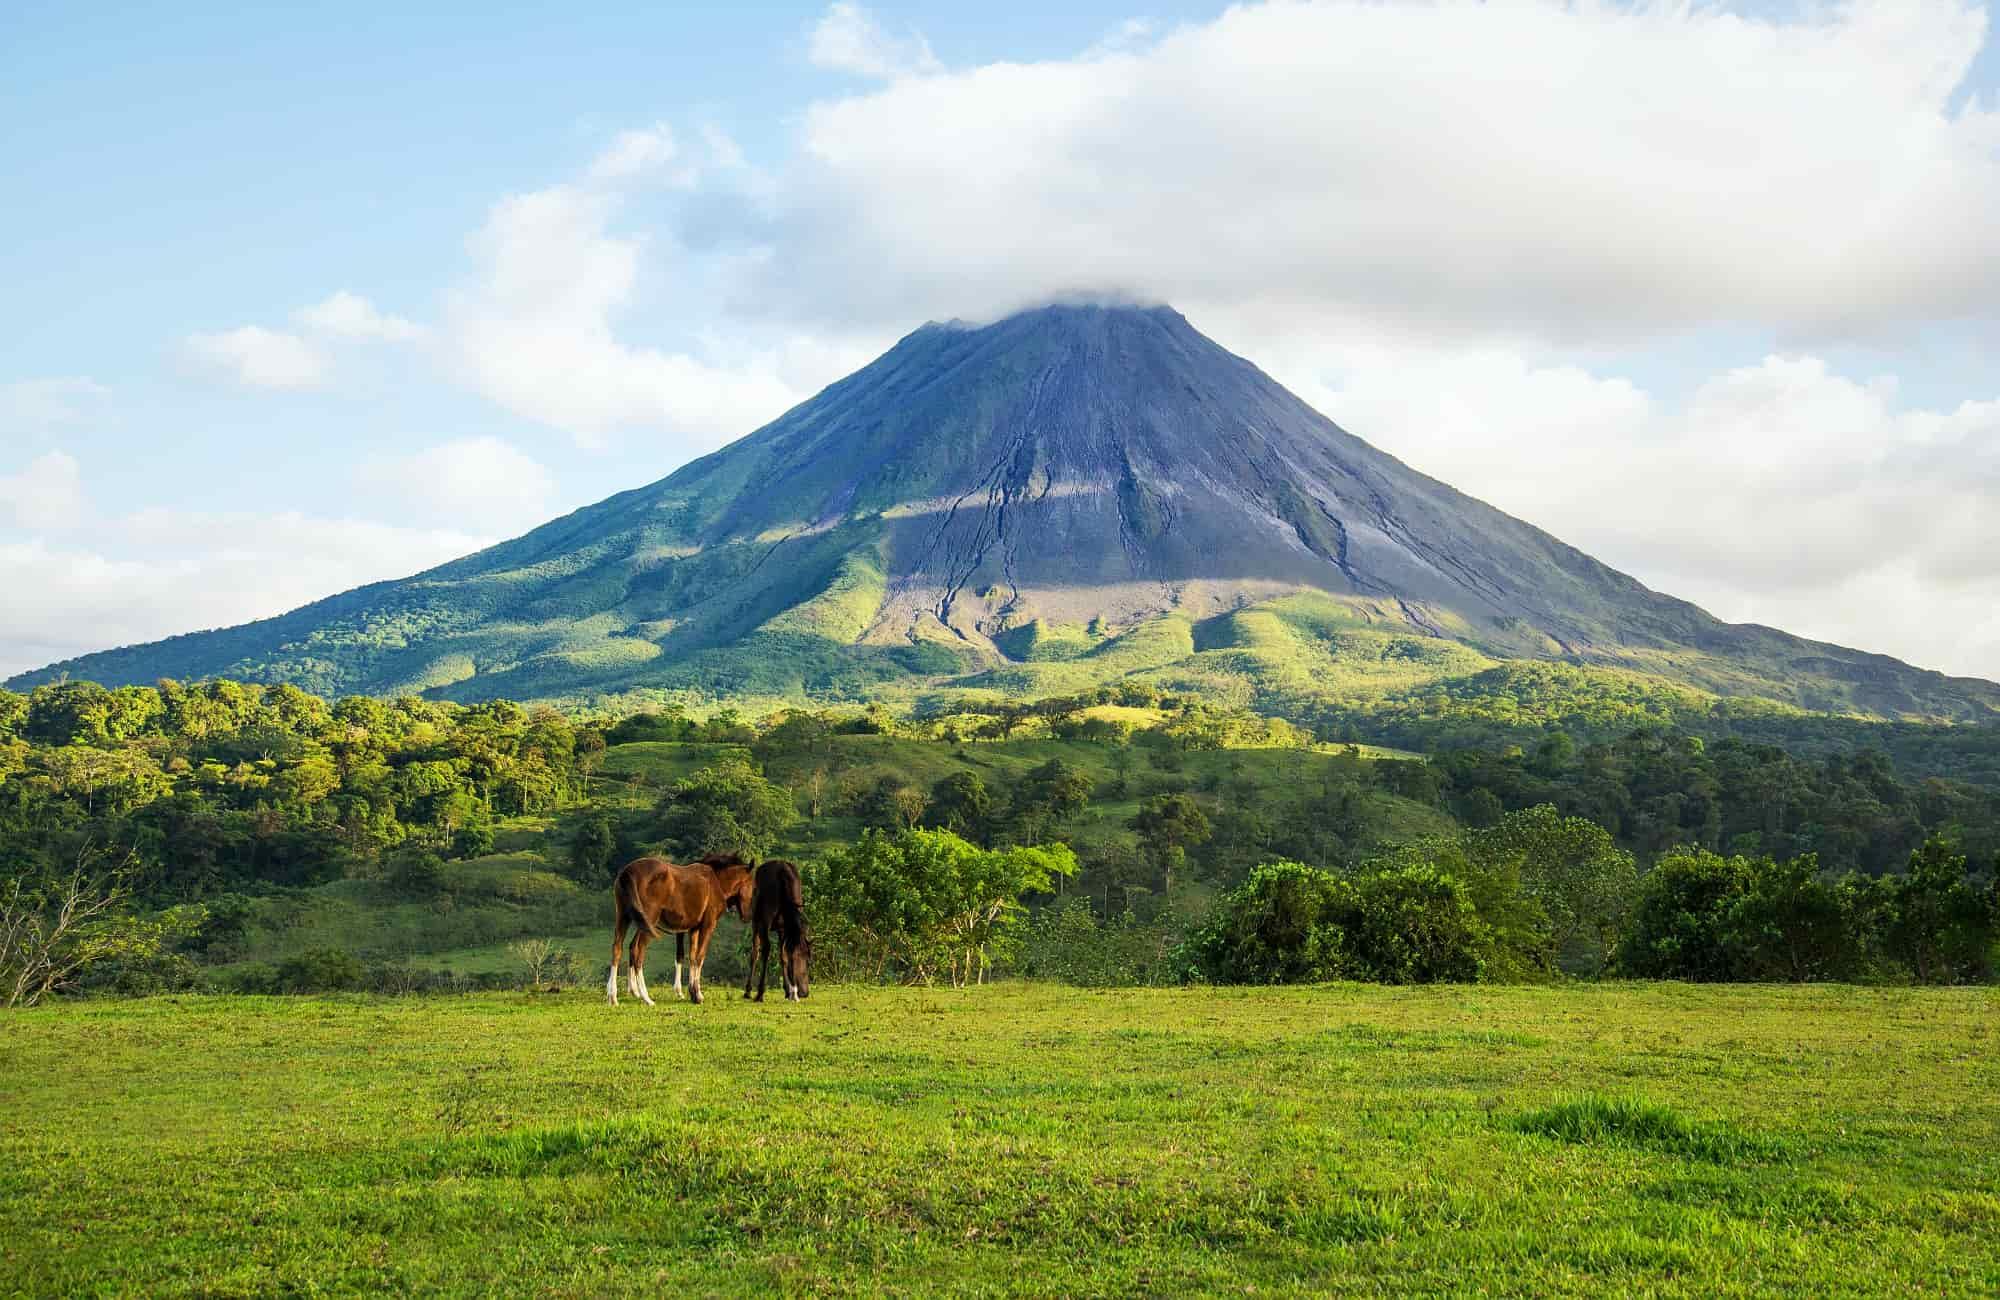 Voyage Costa Rica - Le volcan Arenal - Amplitudes